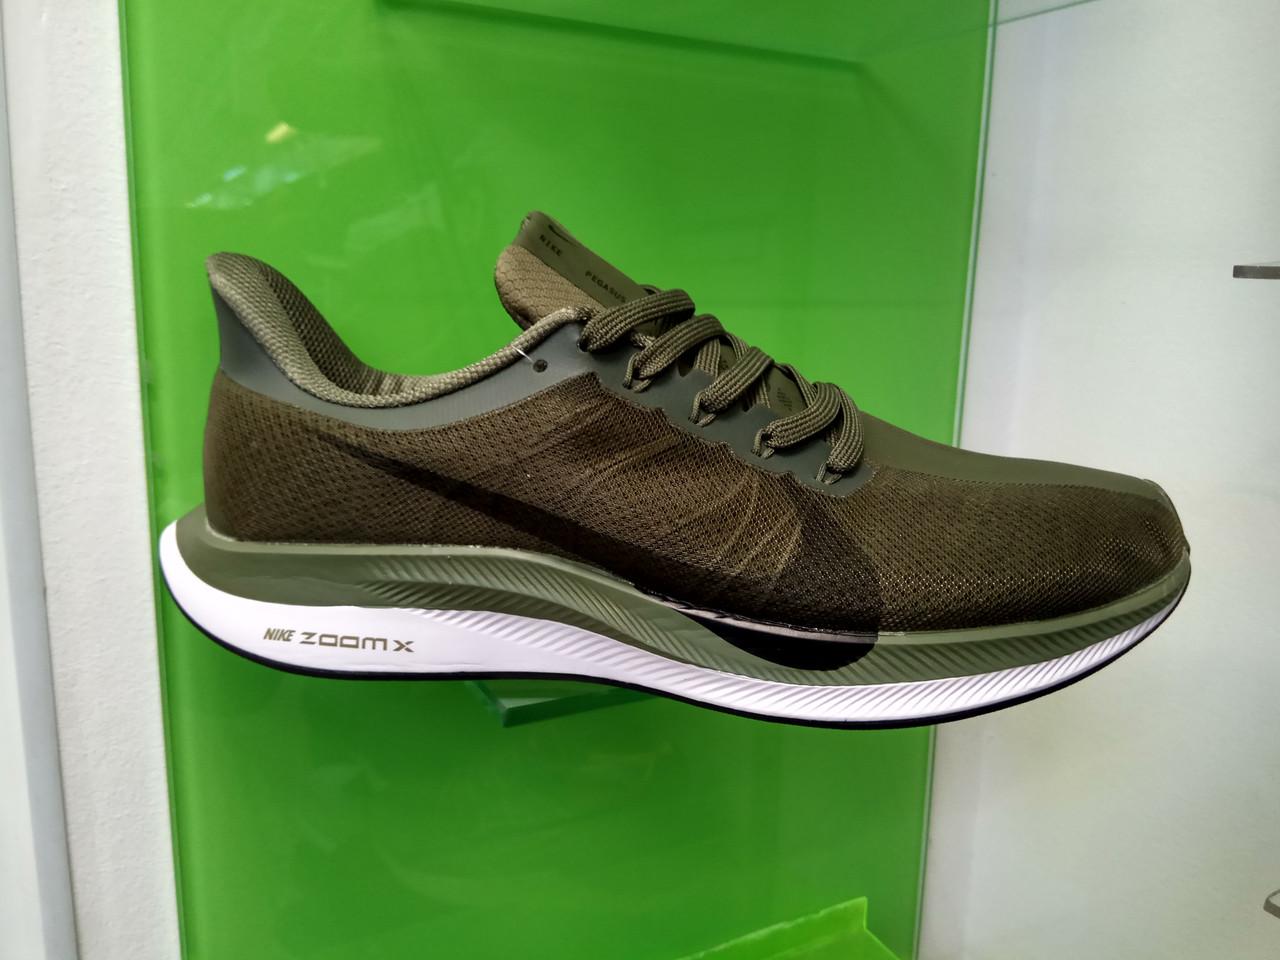 Мужские кроссовки в стиле Zoom Pegasus 35 Turbo Green, размеры с  41 по 45